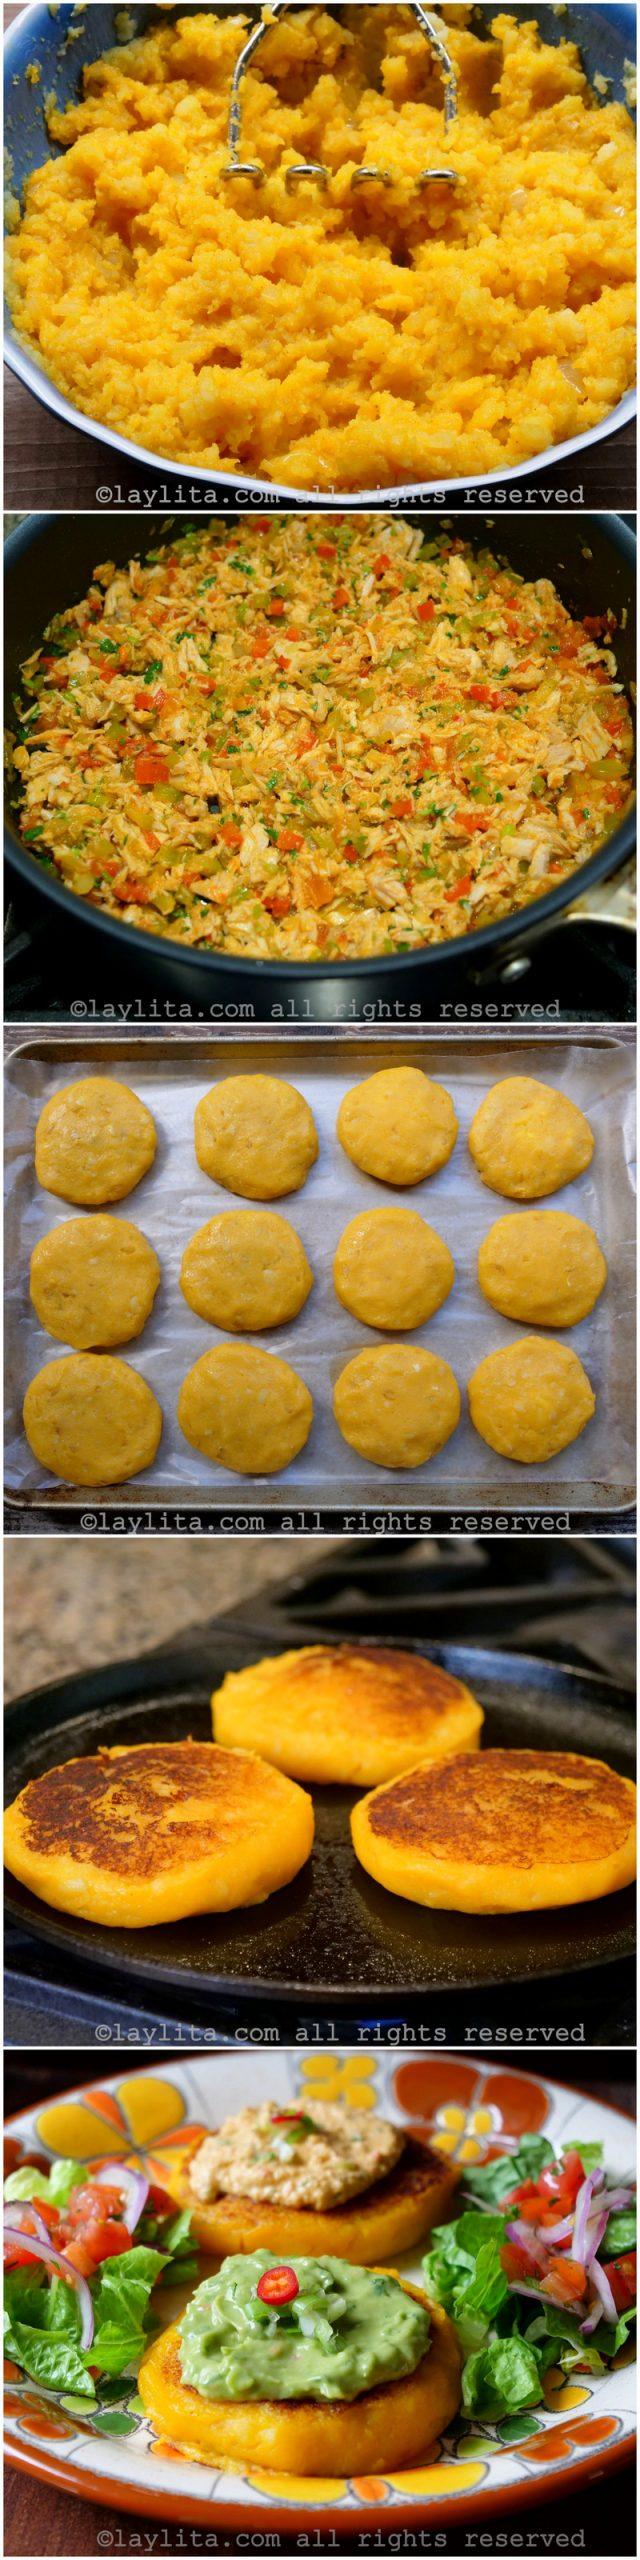 Preparación paso a paso de las tortillas o tortitas de papa con atún